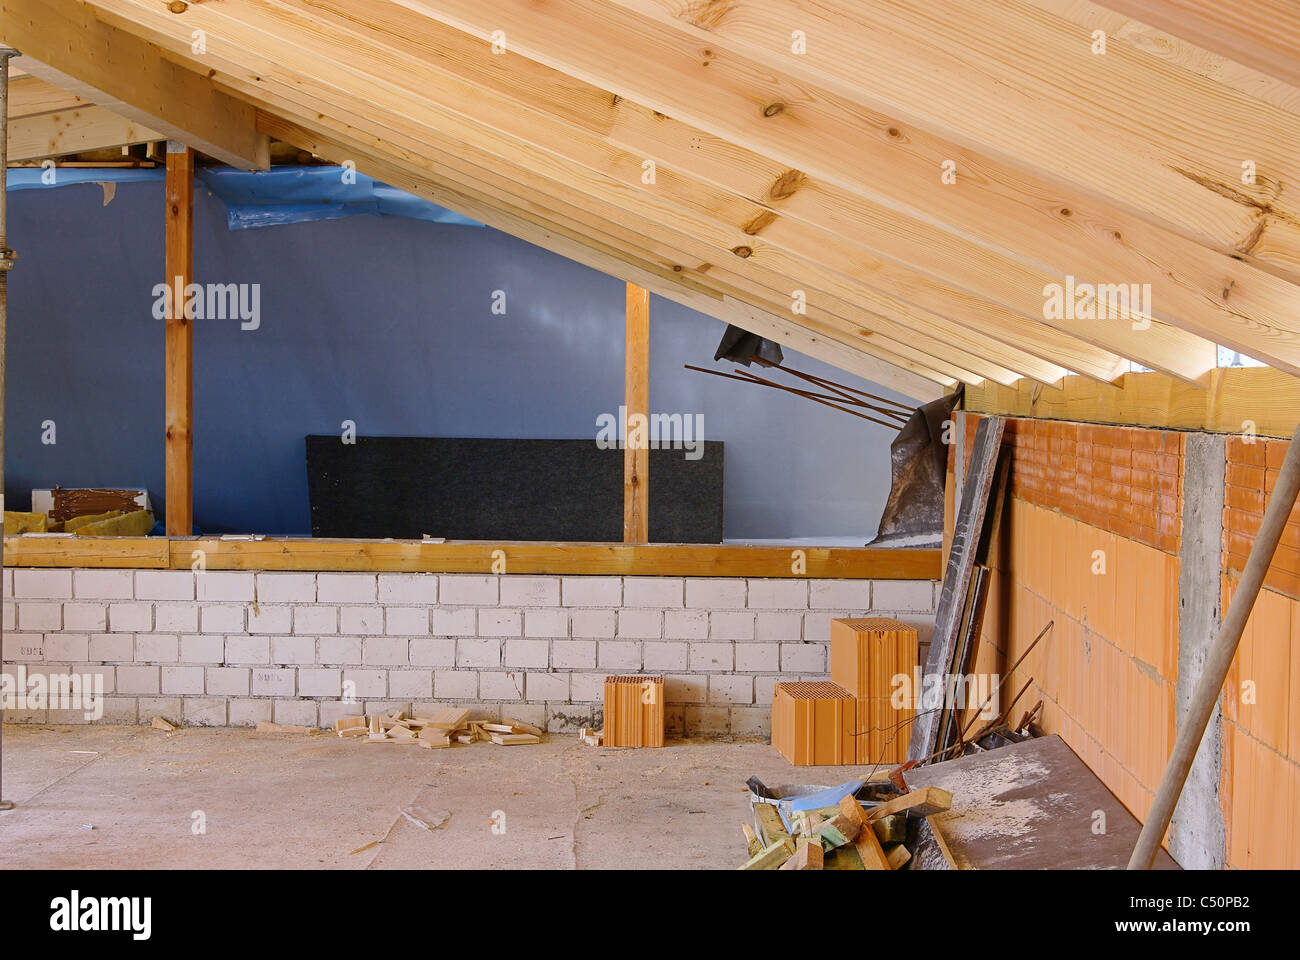 dachstuhl ausbauen - dachstuhl rekonstruieren 08 stockfoto, bild